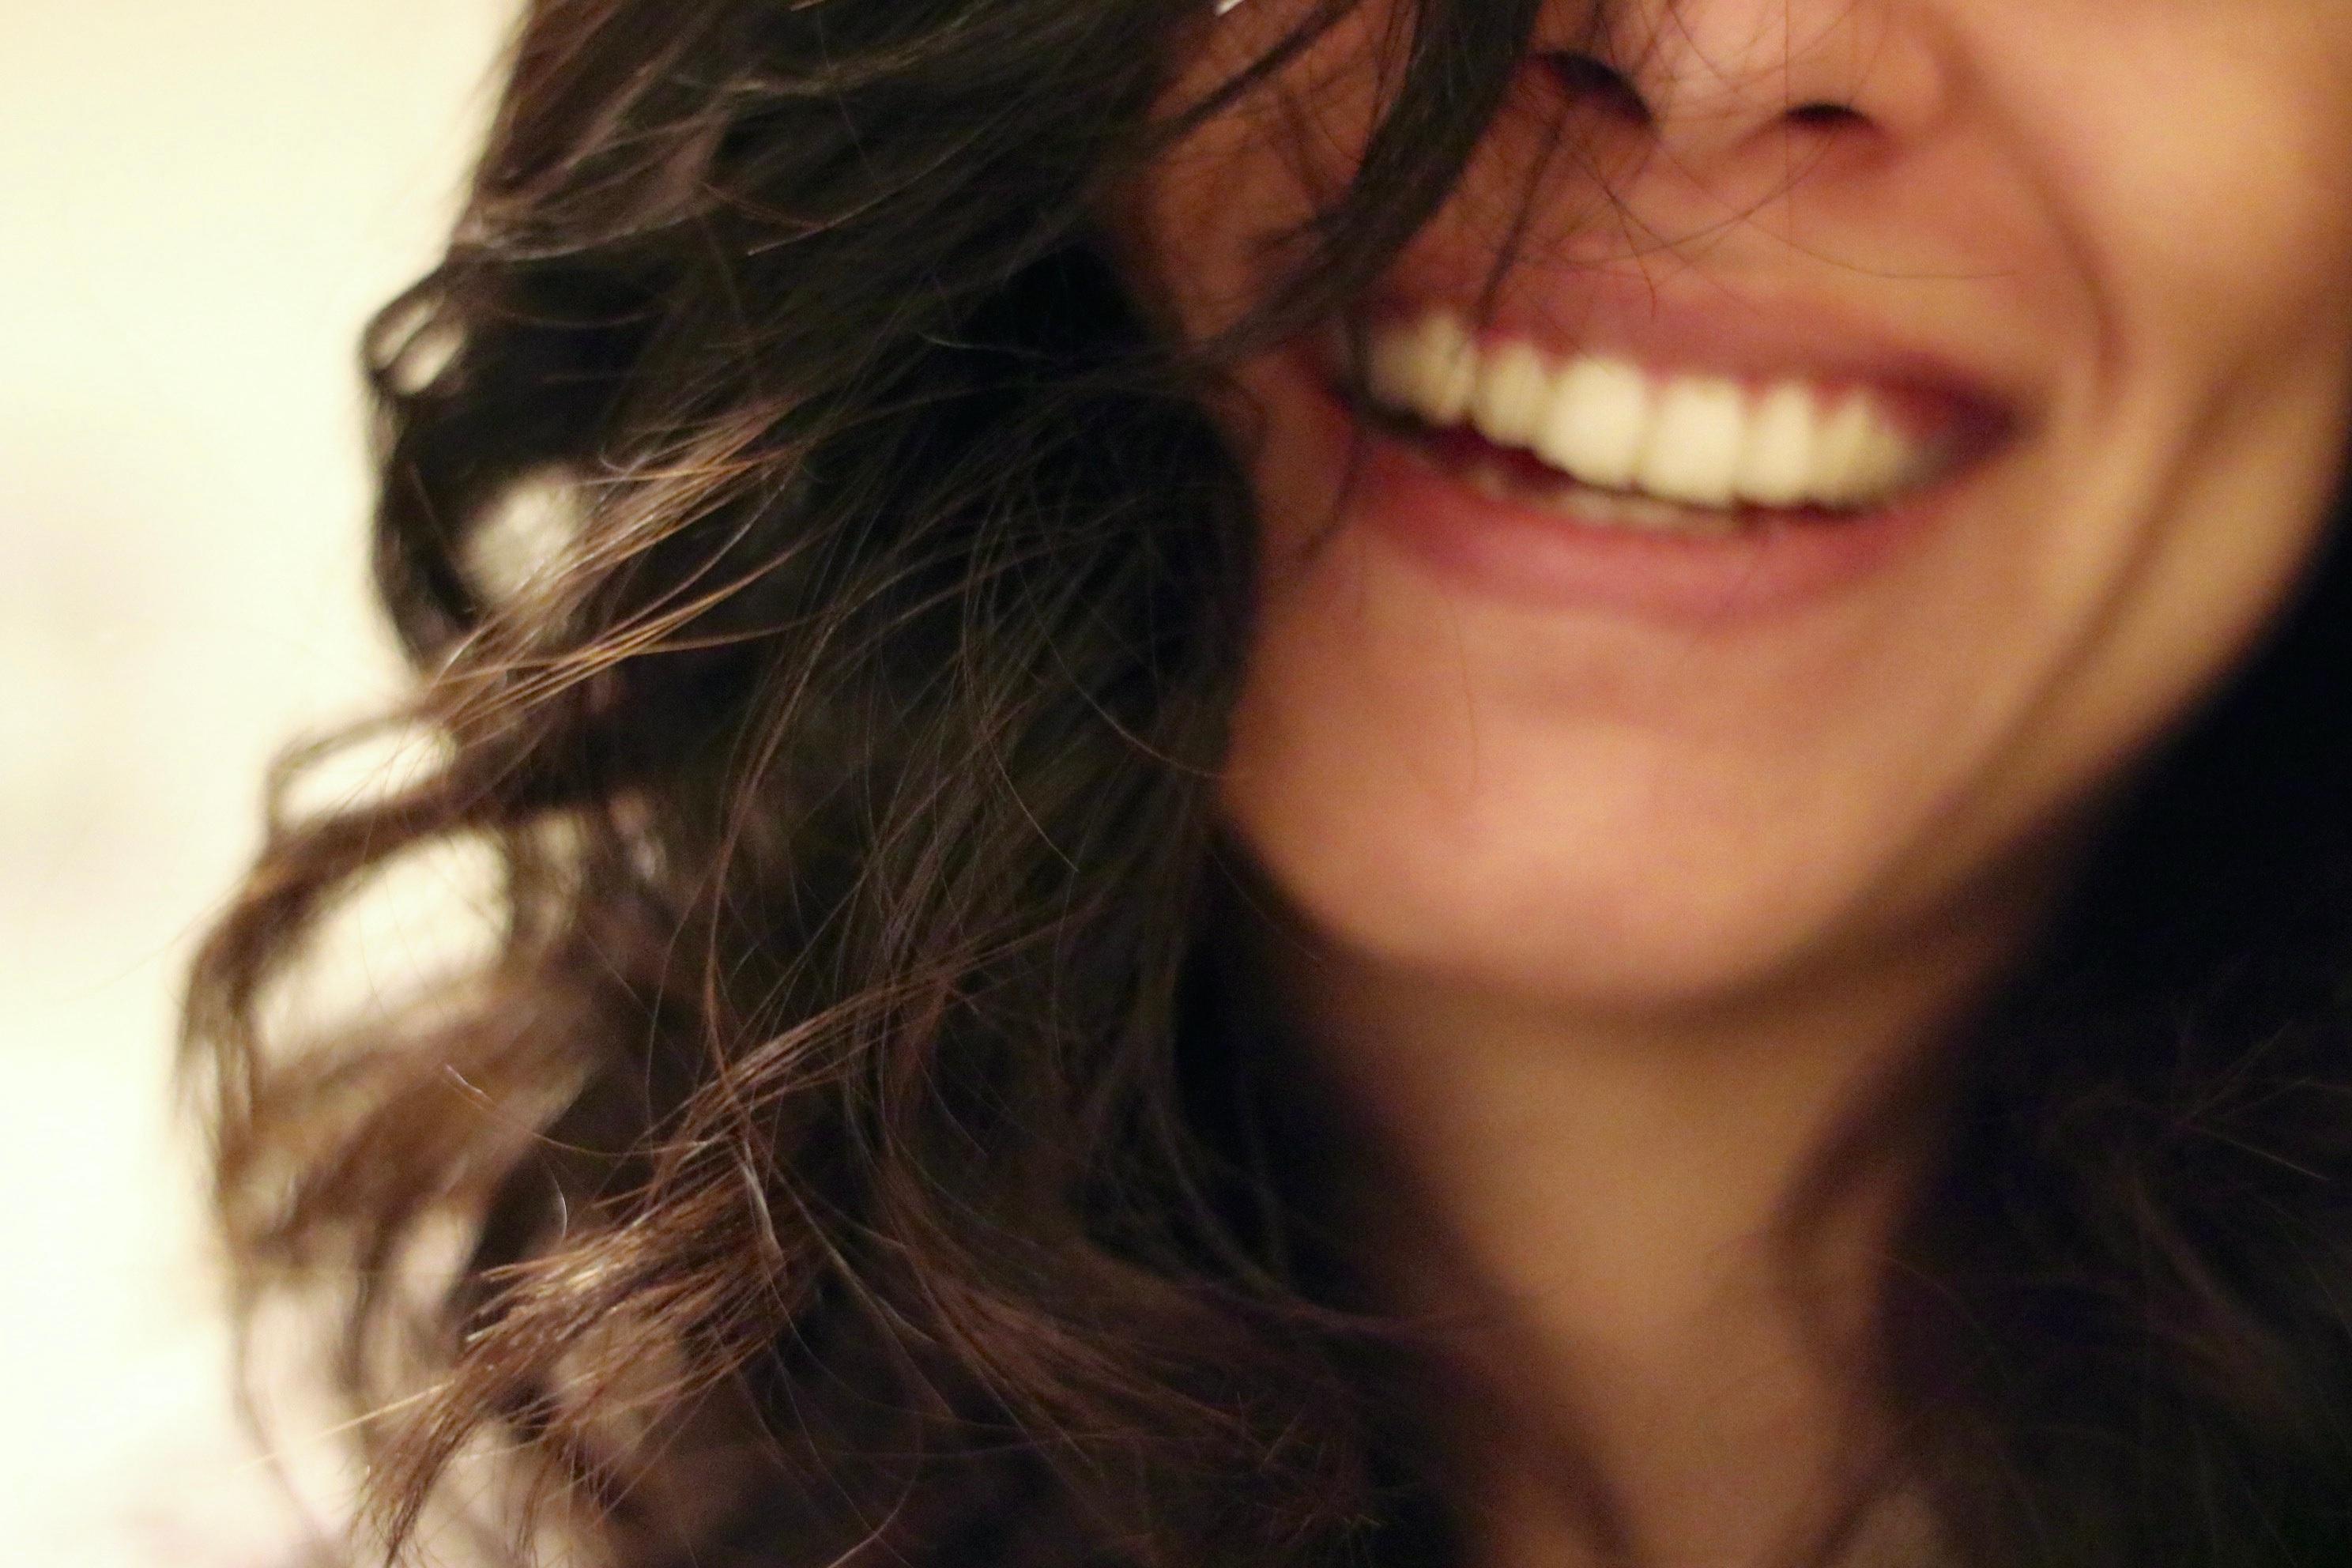 women,smile